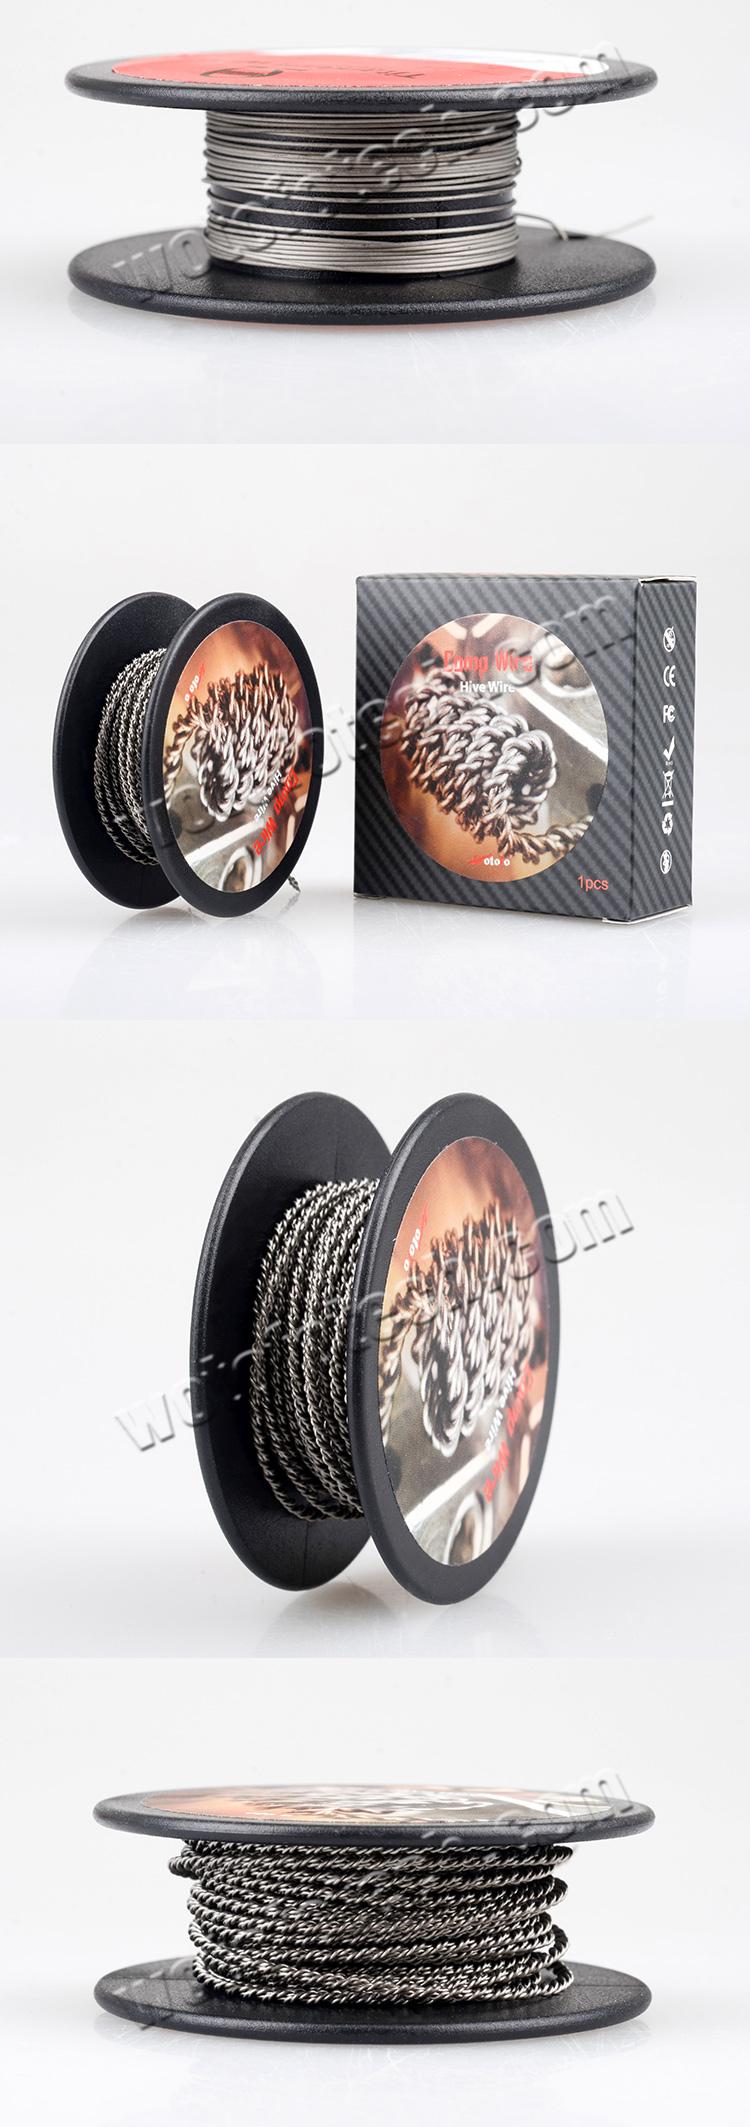 Beautiful Tiger Wire Coil Images - Wiring Diagram Ideas - blogitia.com